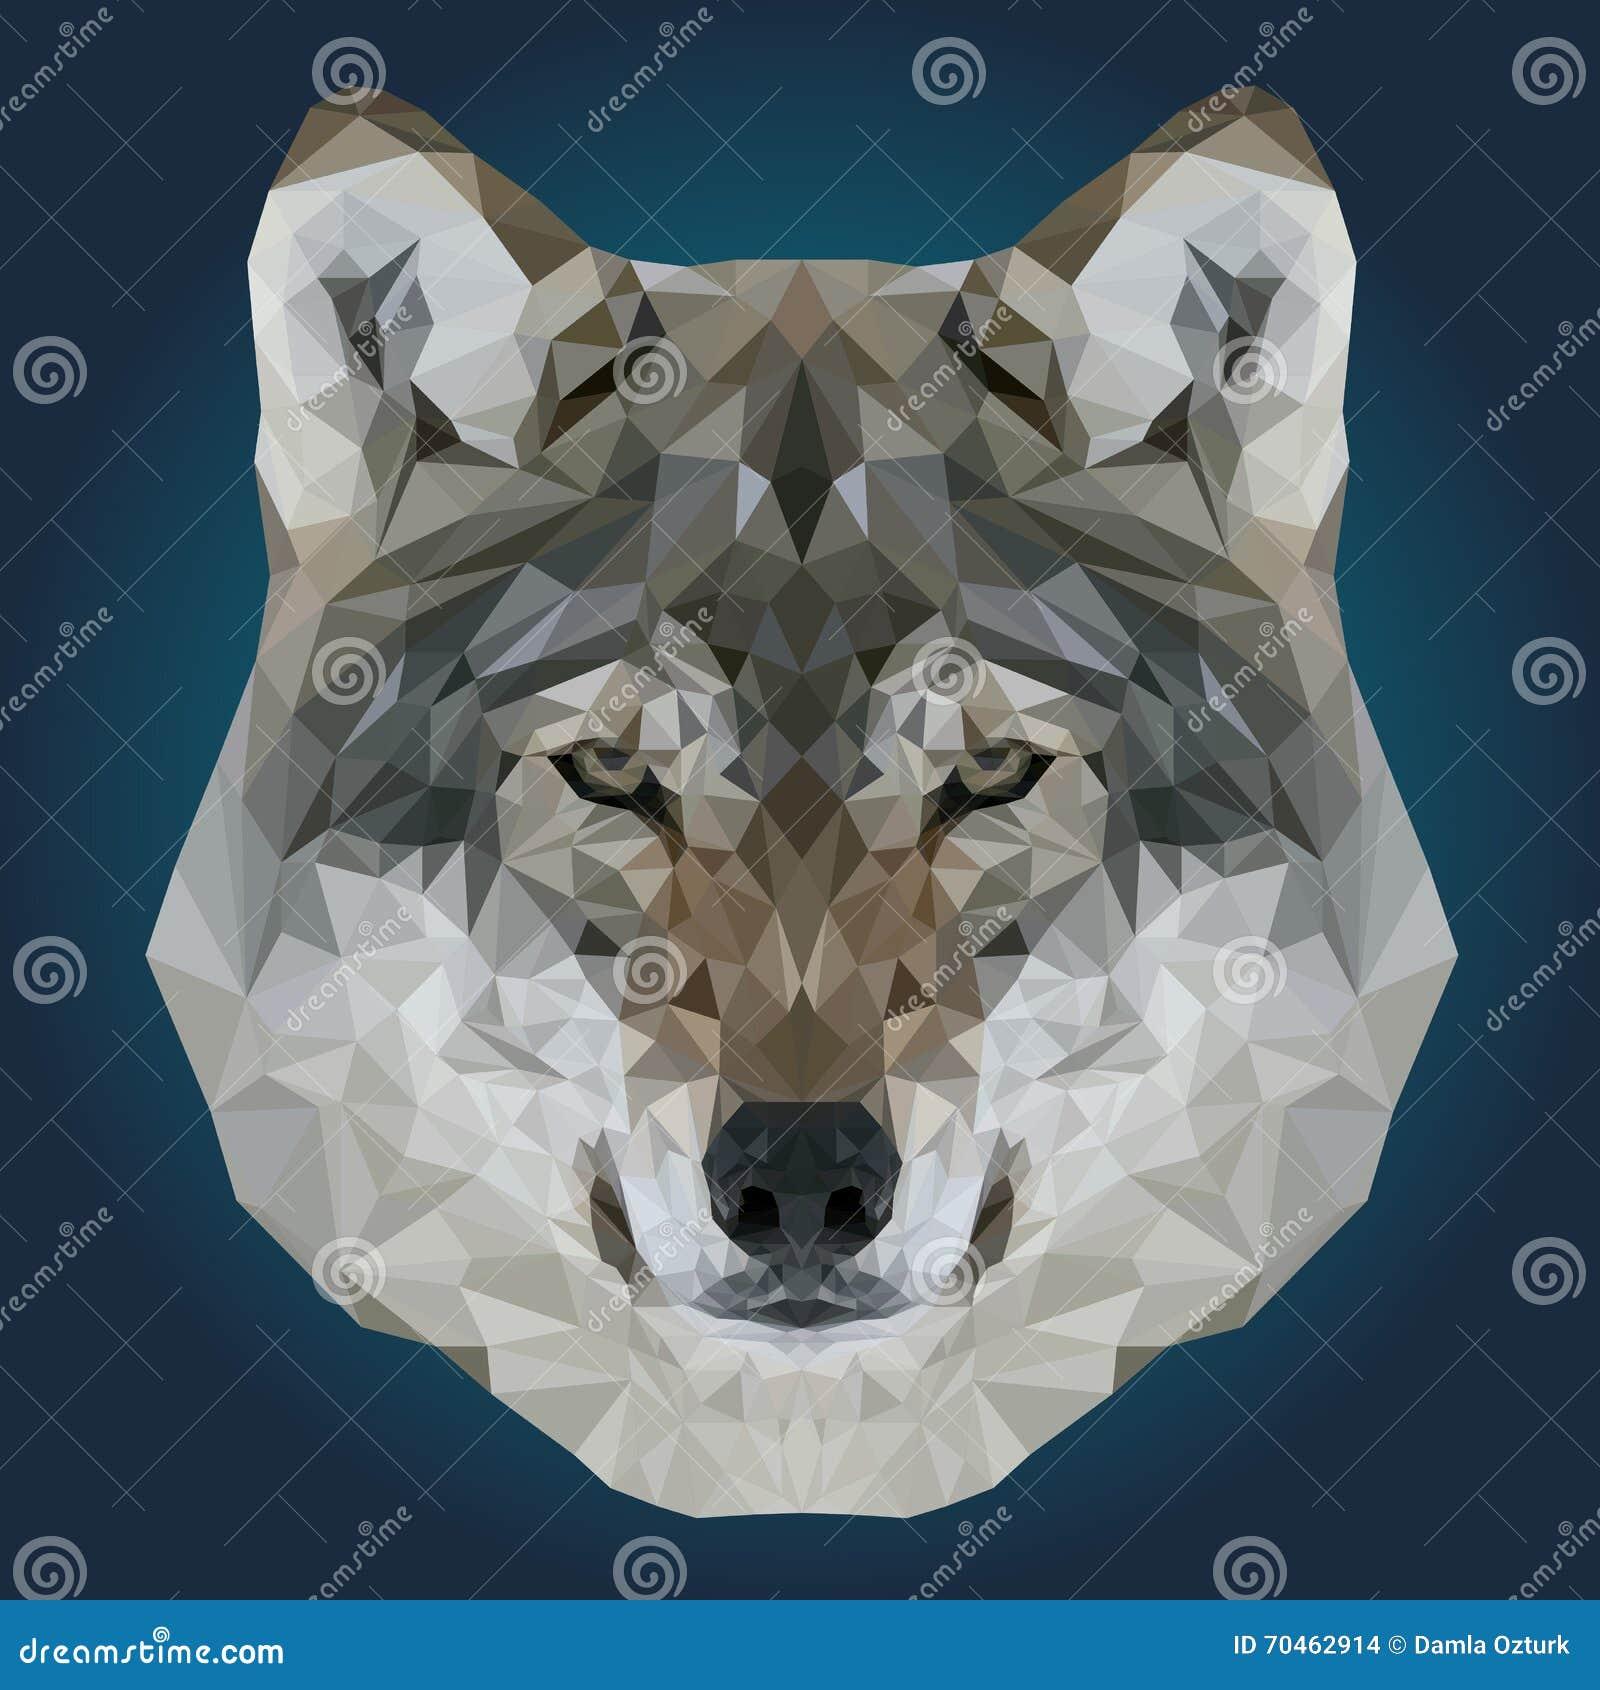 Wolf Low Poly Design Geometric Vector Animal Illustration